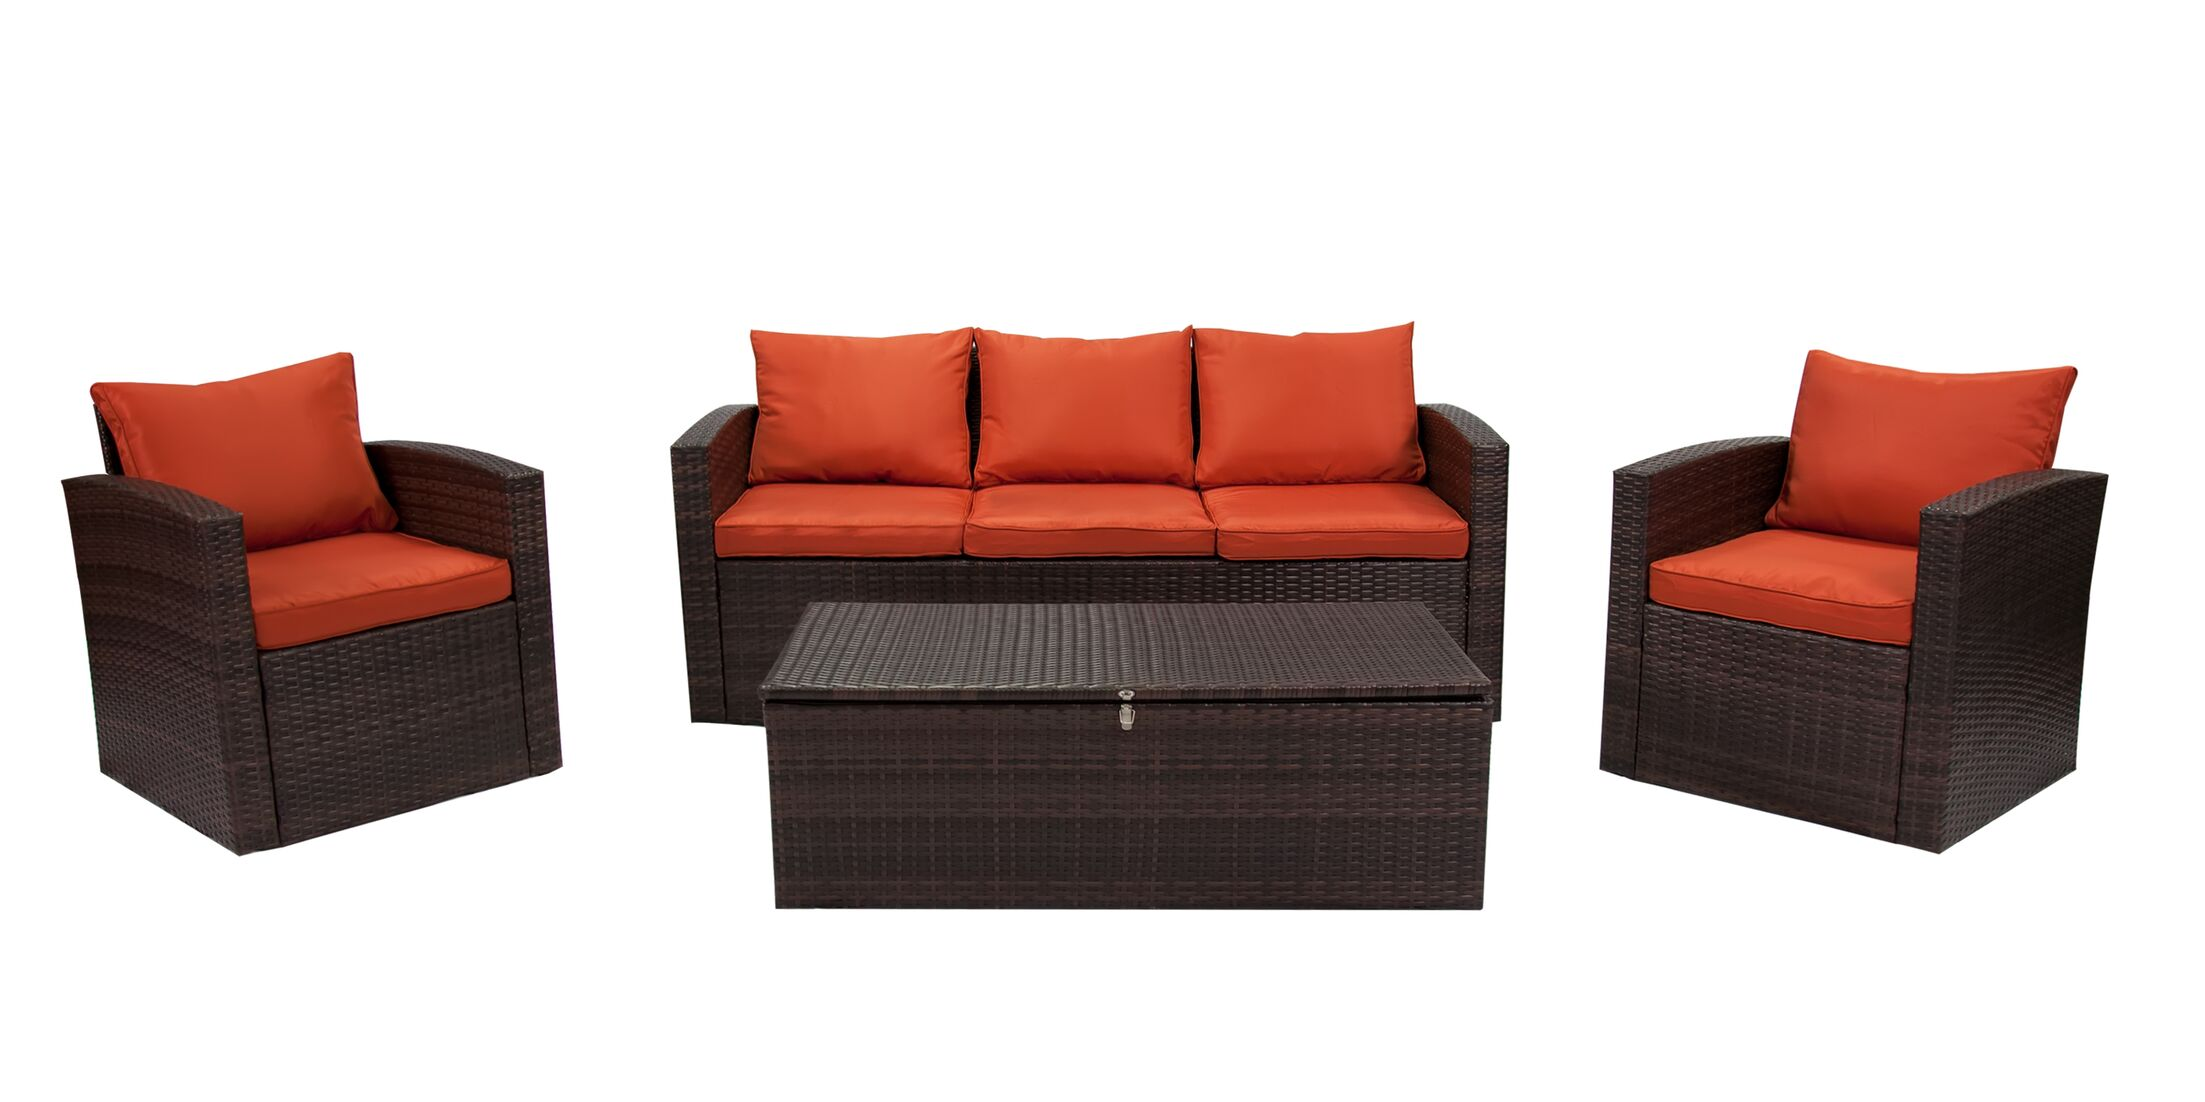 Marisa 7 Piece Rattan Sofa Seating Group Frame Finish: Brown, Fabric: Orange